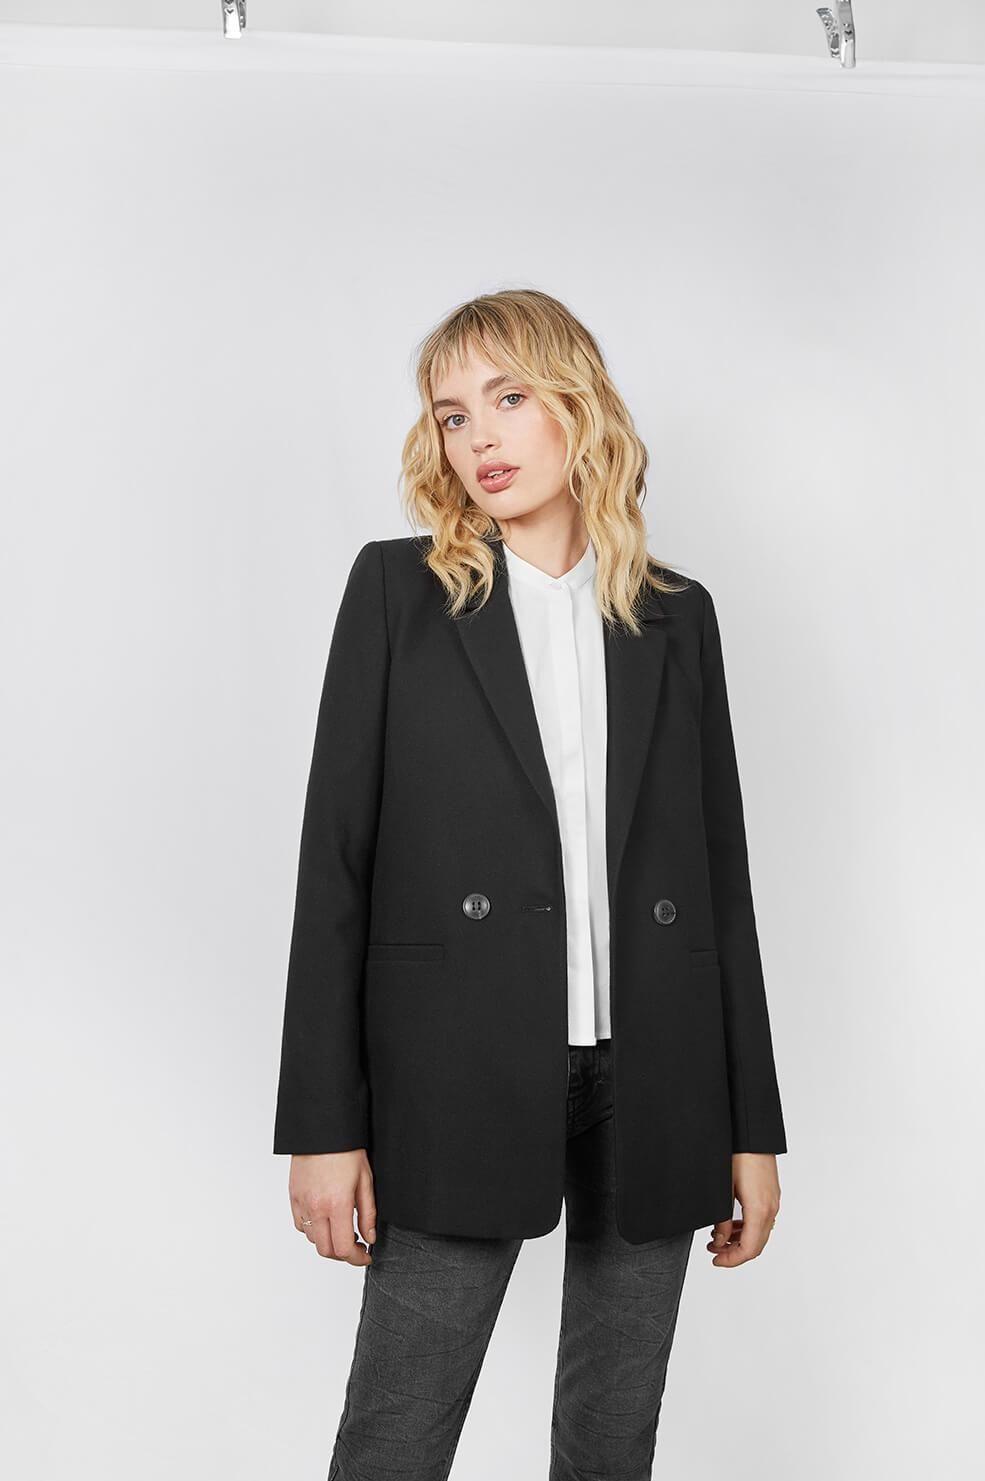 Medium ANINE BING Women/'s Grey Pinstripe Blazer Size UK 12